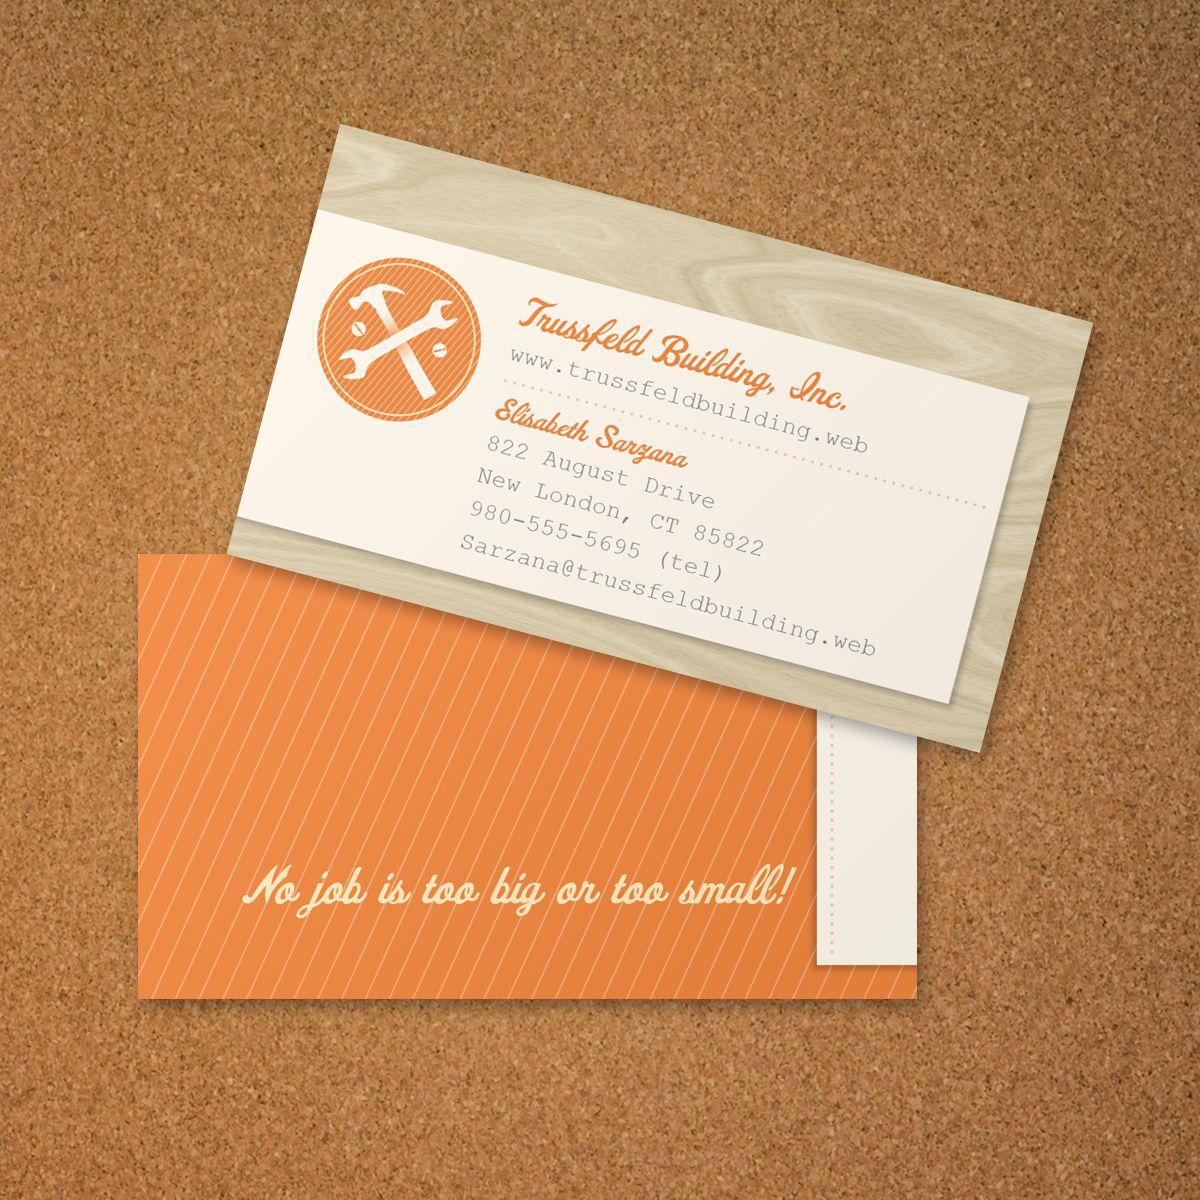 Premium Business Cards Enter Your Text Business Cards Creative Business Card Inspiration Business Card Design